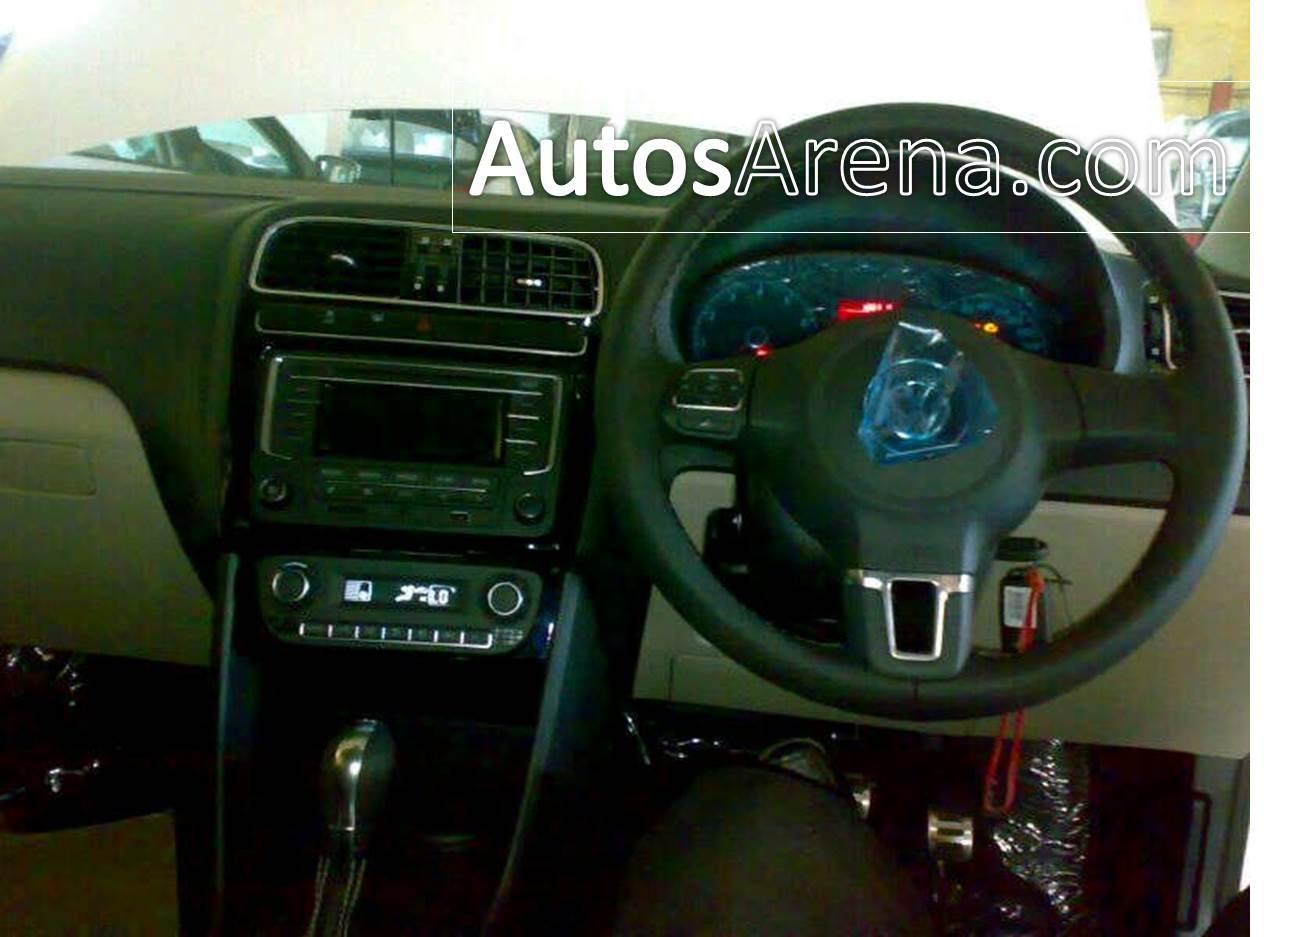 Polo GT TSI dashboard